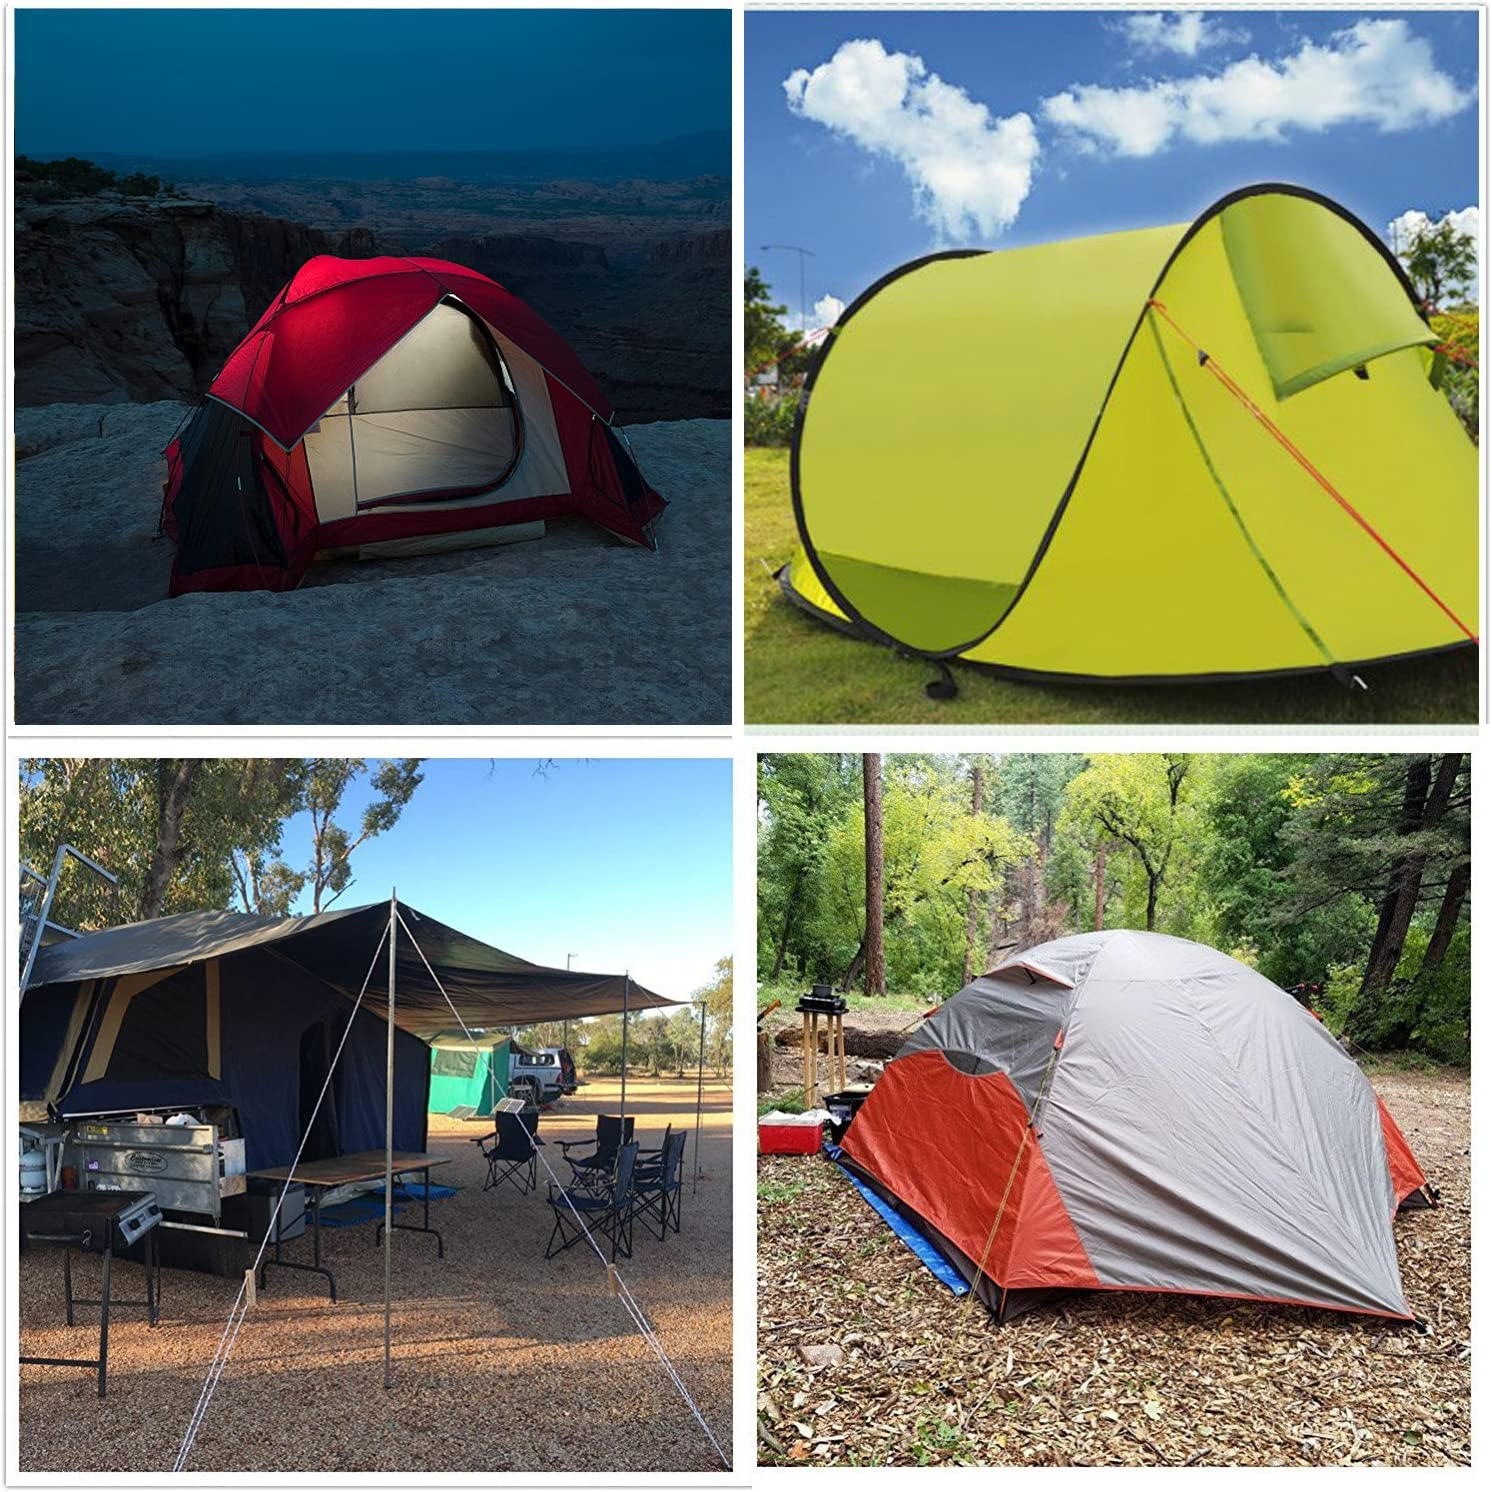 Pack of Heavy Duty 30cm Red Plastic Multipurpose Tent Pegs 25Pcs